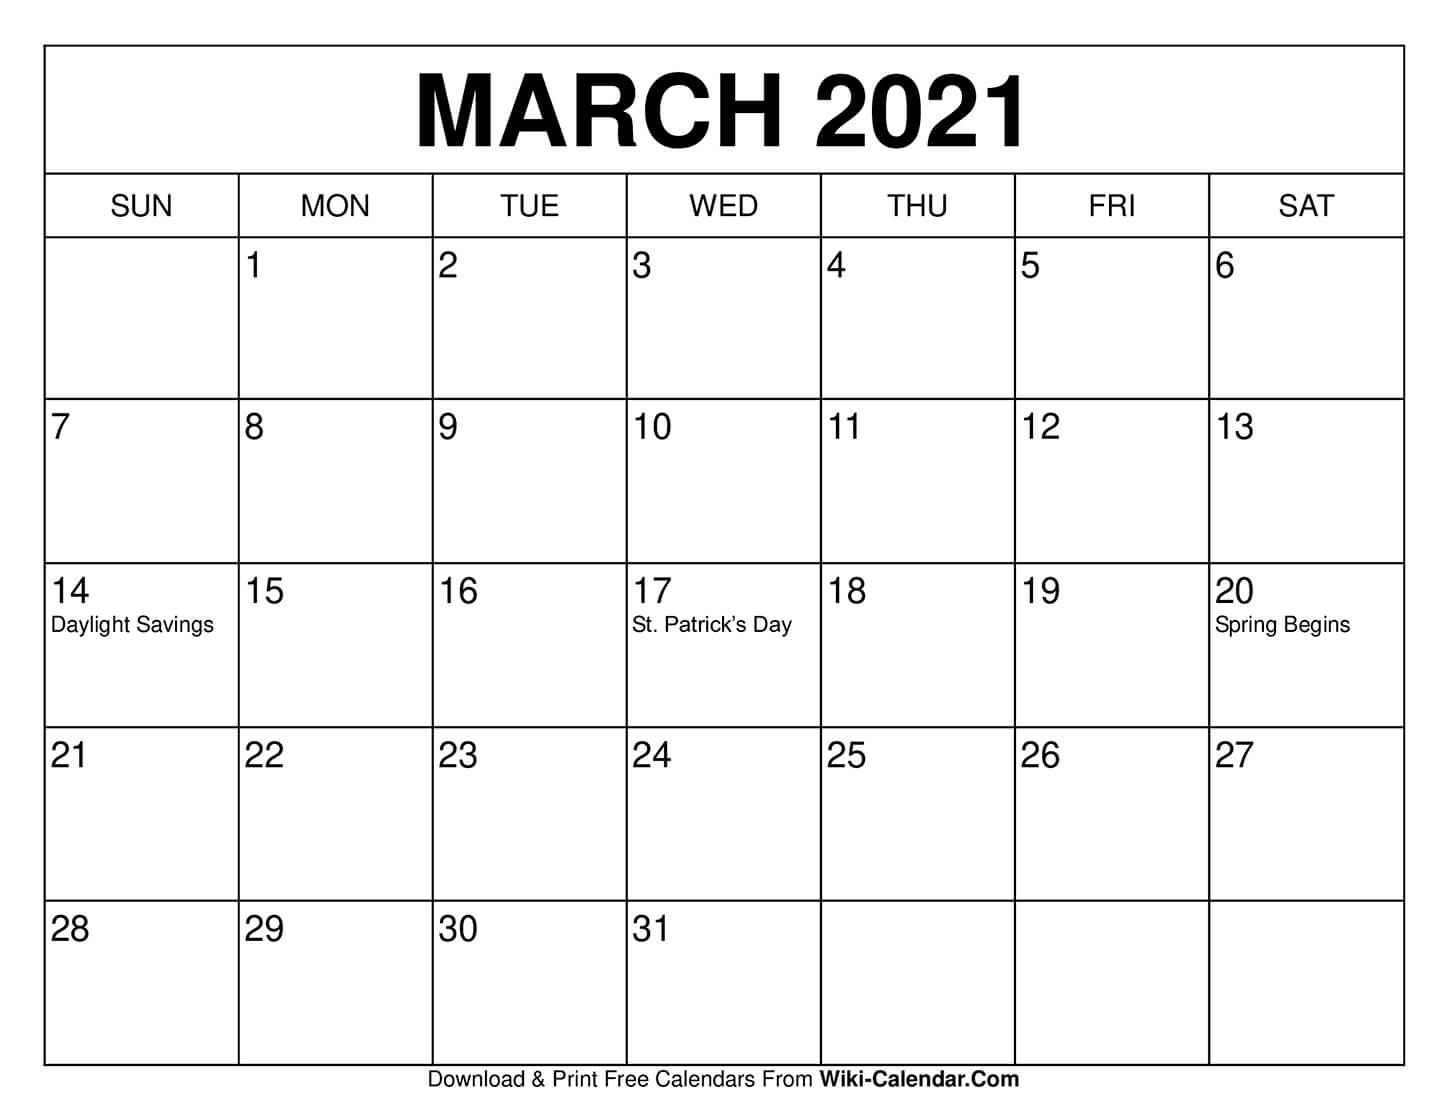 Free Print Calendars March 2021